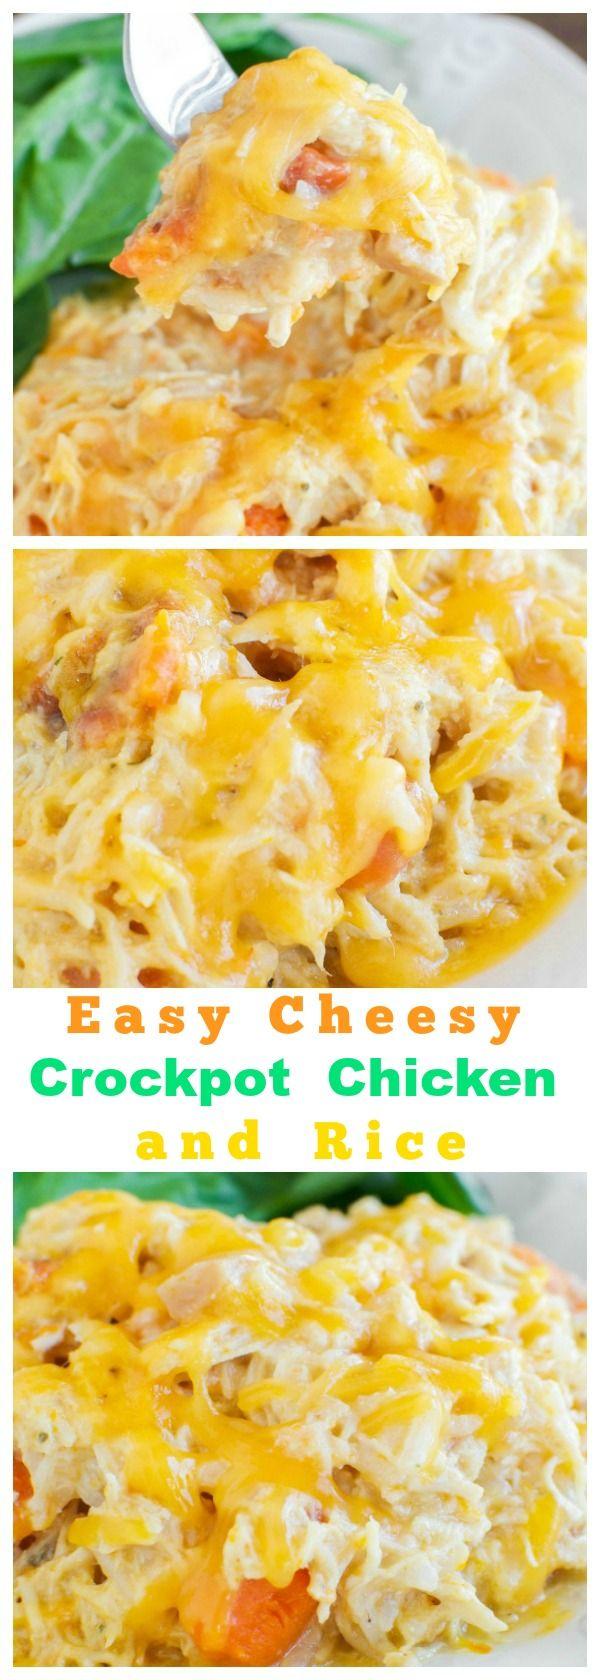 3488 Best Slow Cooker Recipes Images On Pinterest Crockpot Hands